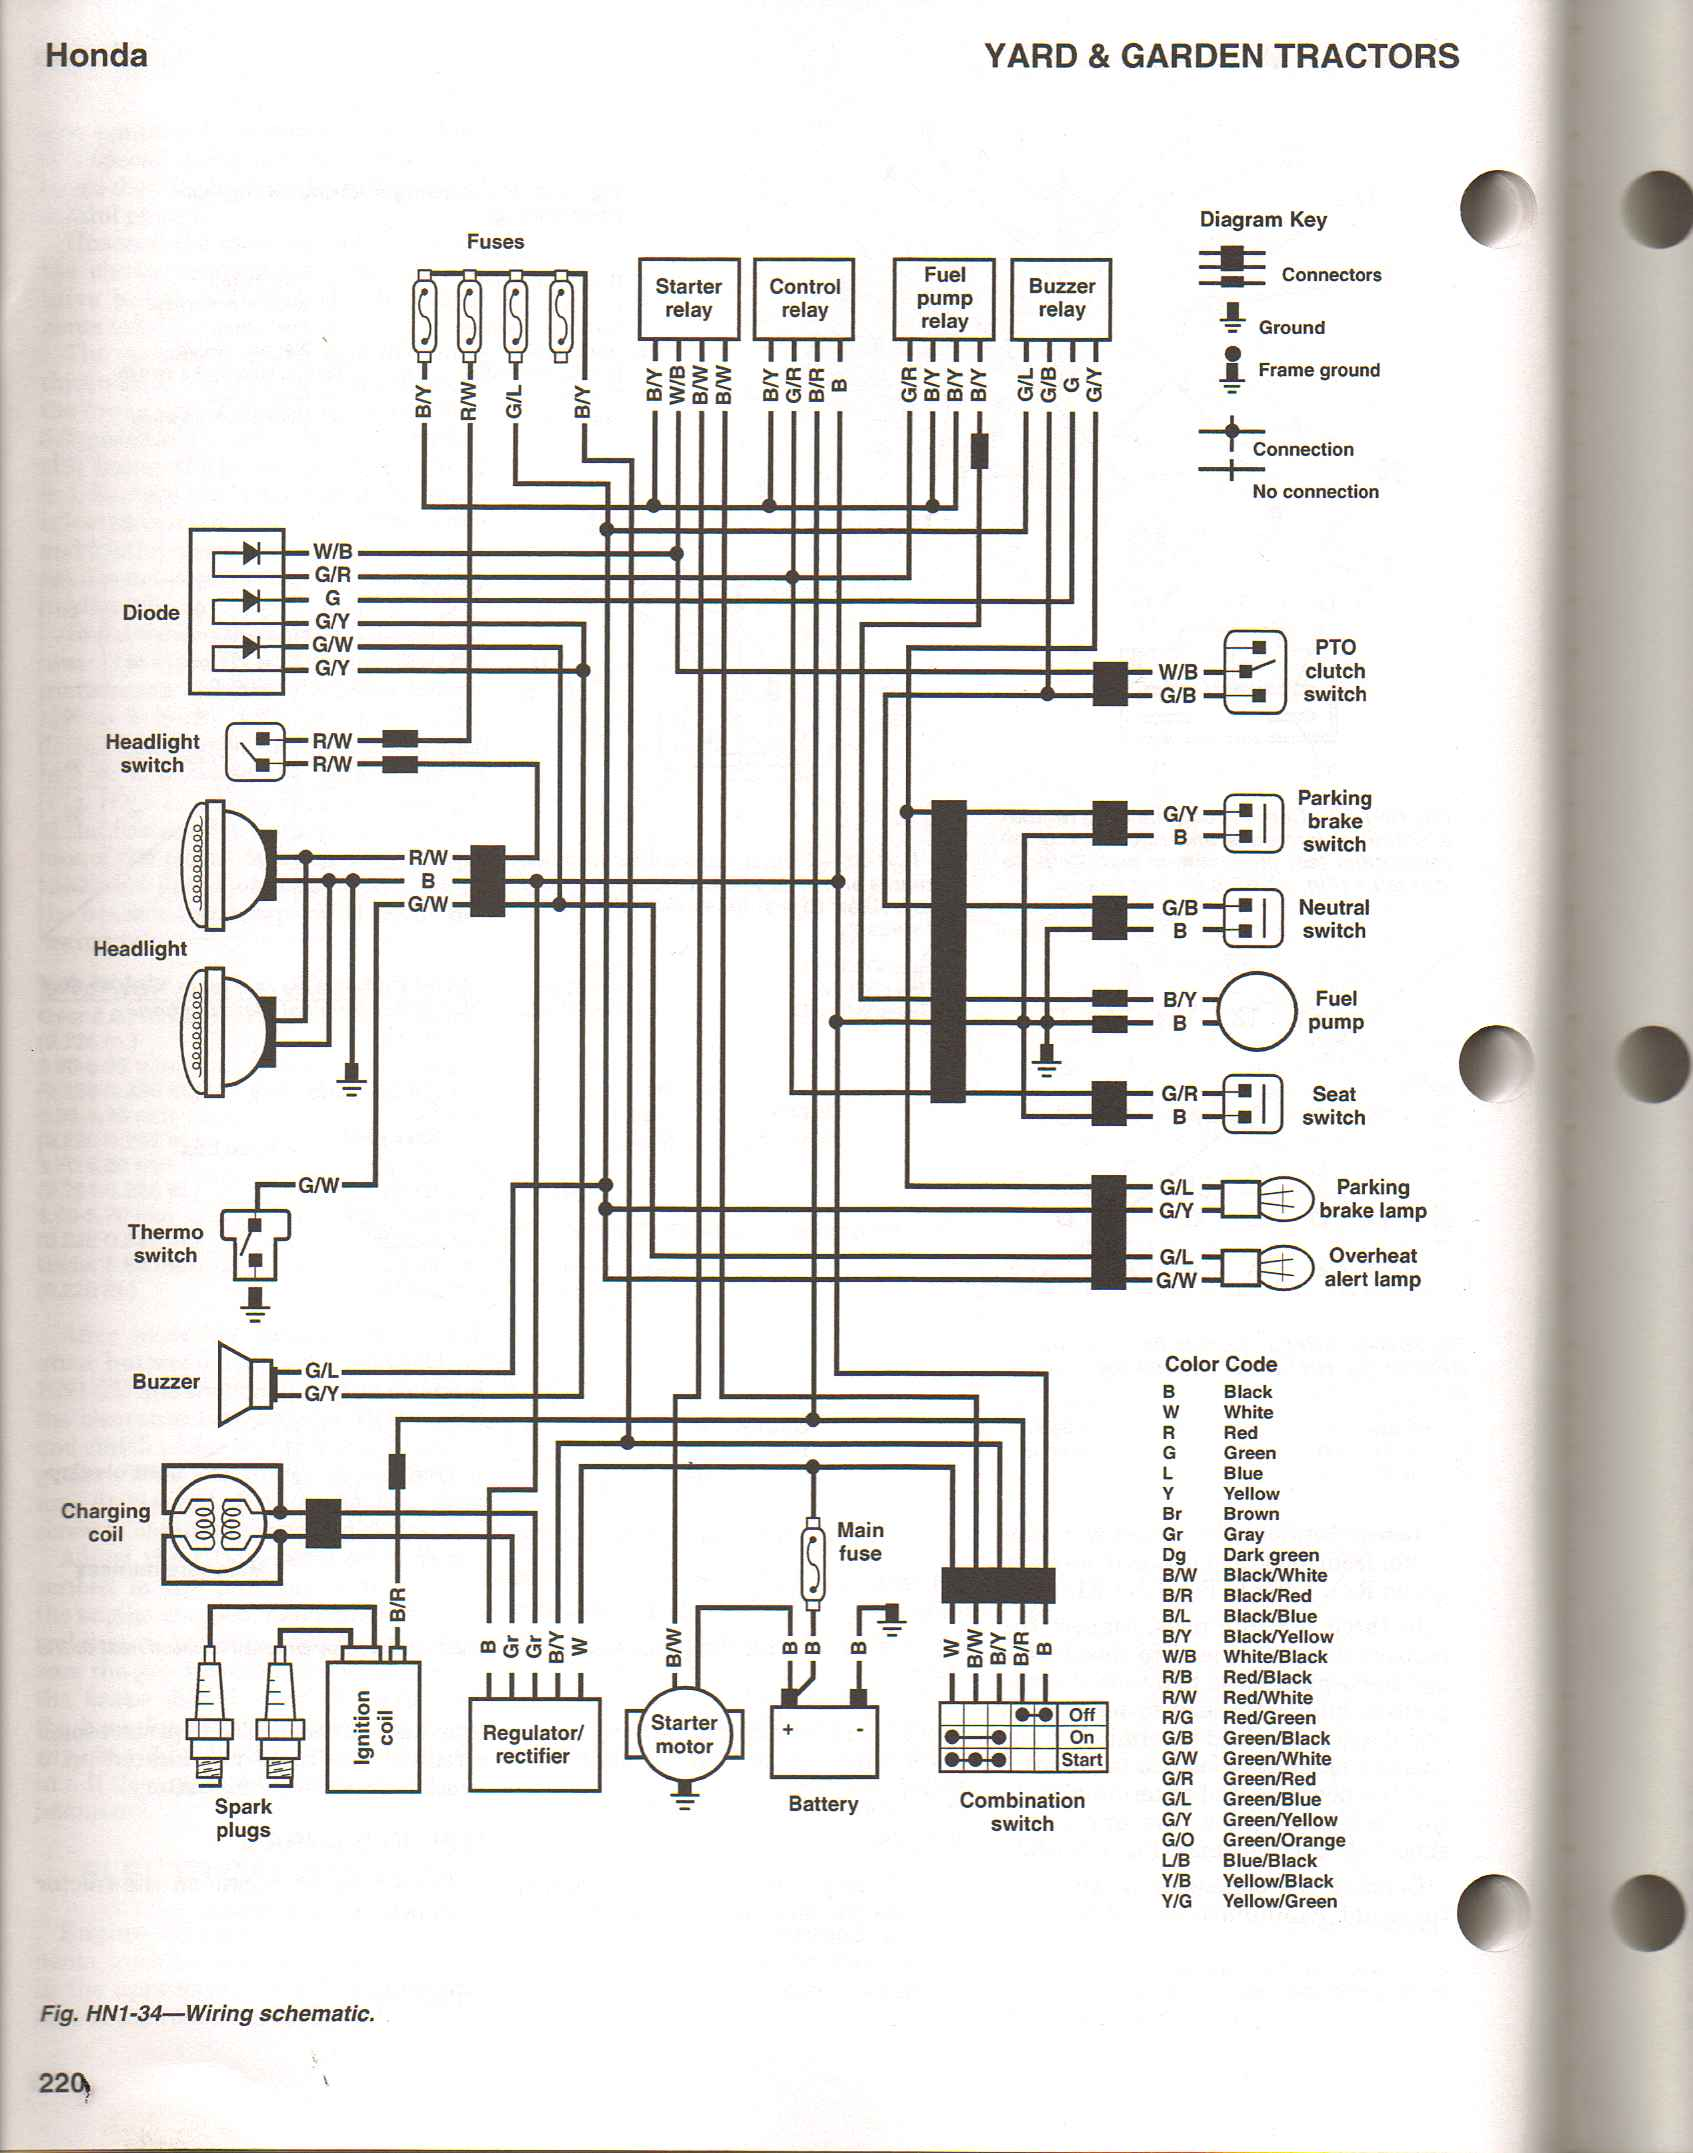 Honda 3813 Wiring Diagram | Wiring Liry on